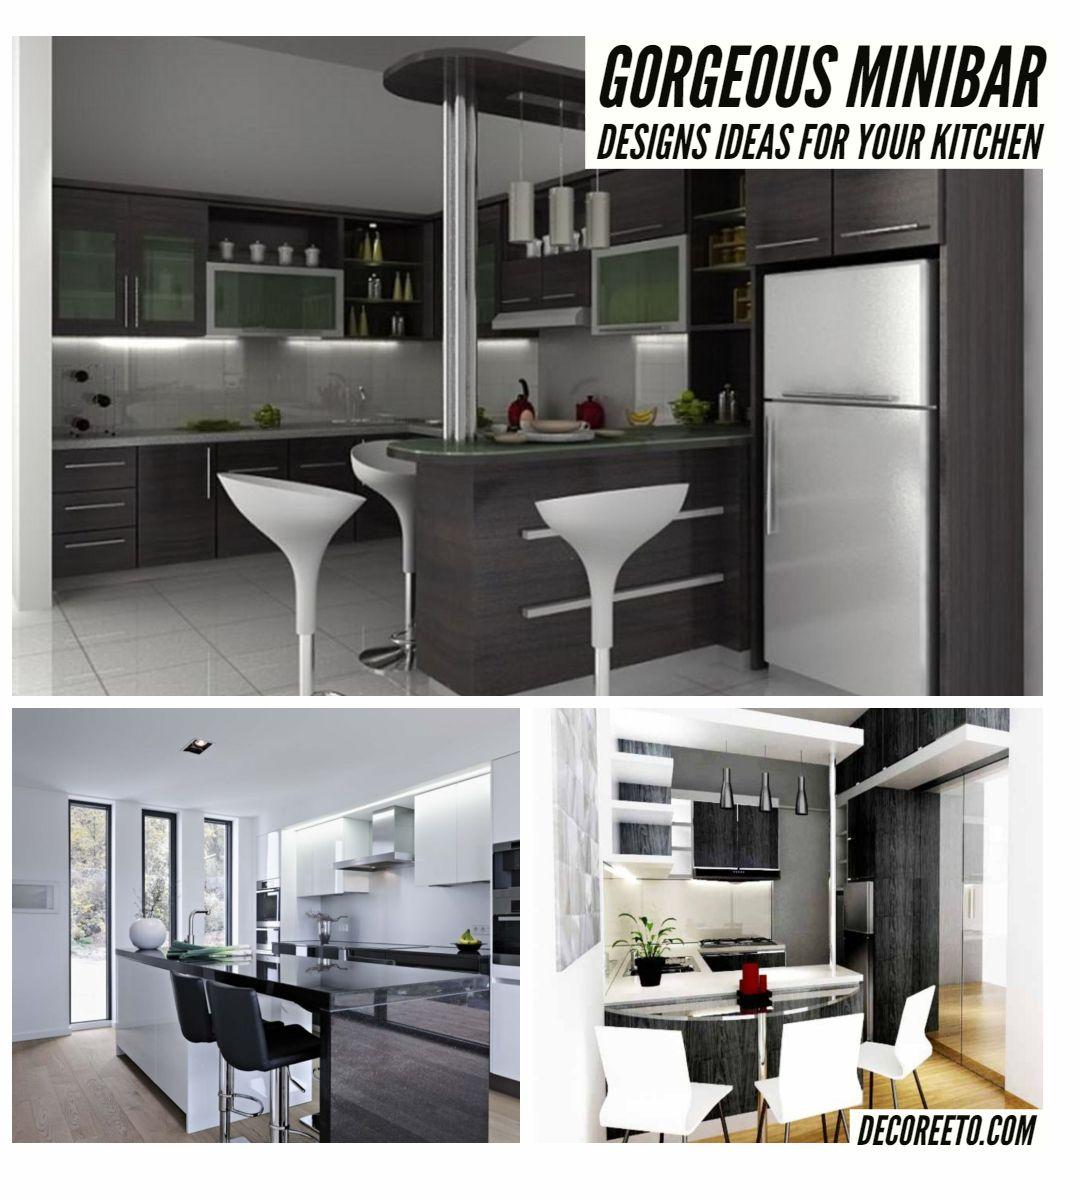 Brilliant 9 Gorgeous Minibar Designs Ideas For Your Kitchen https ...